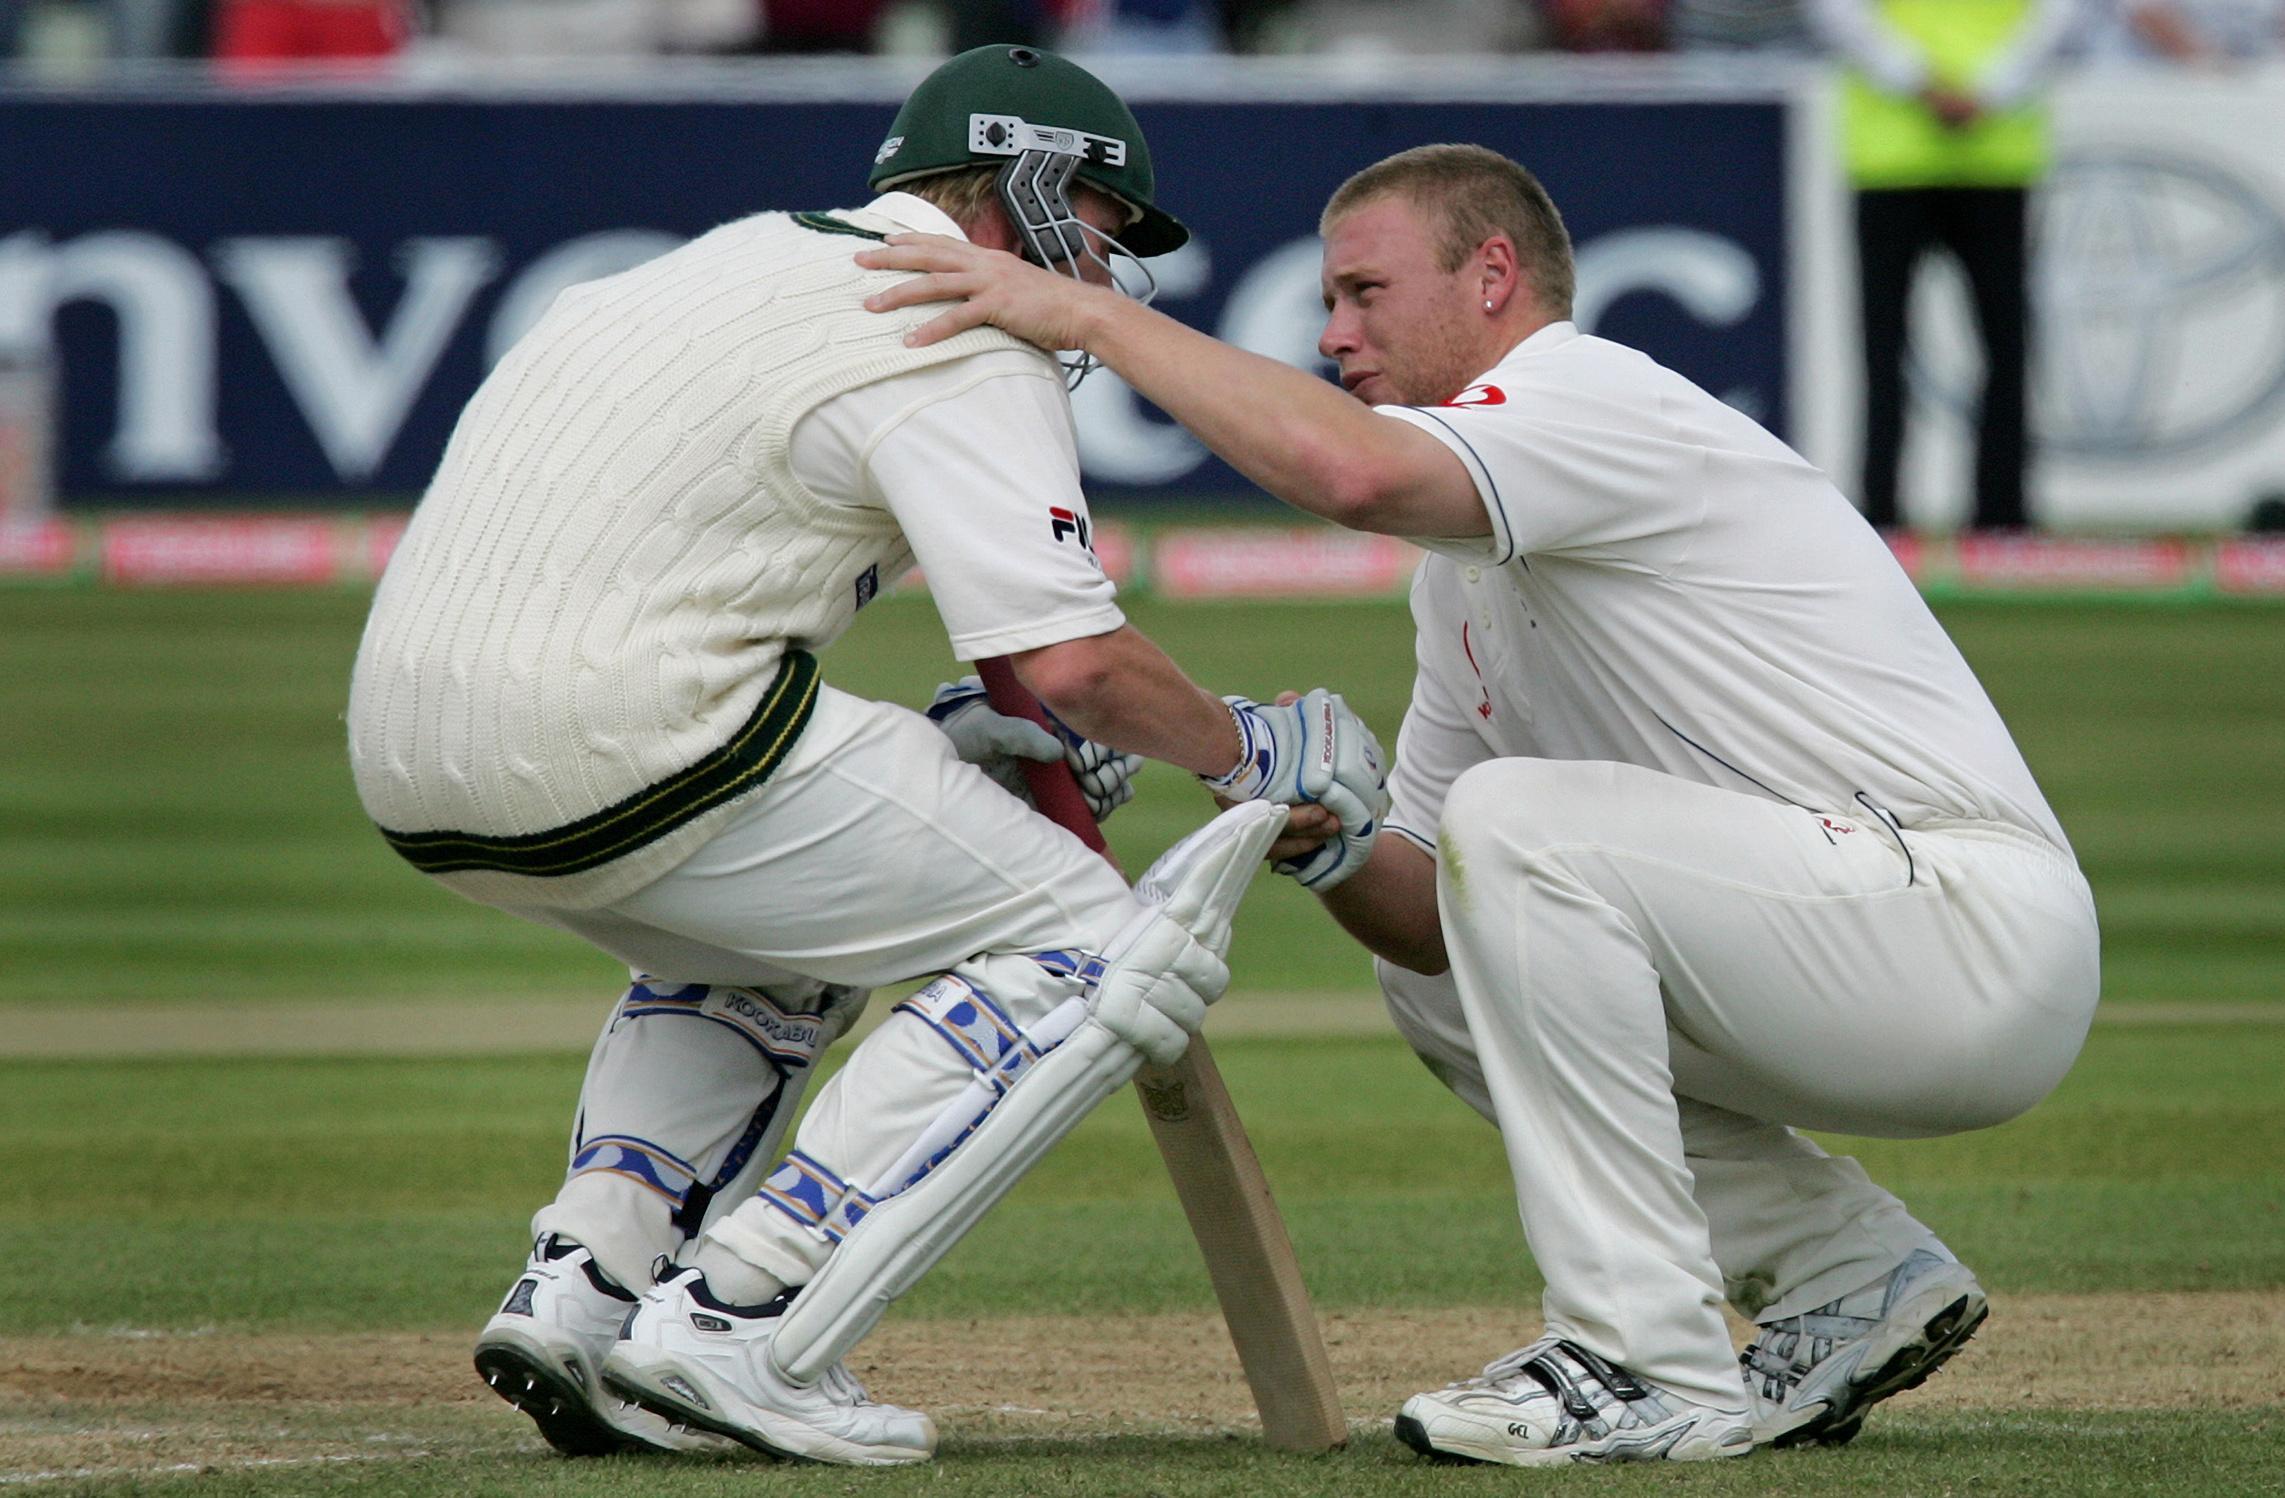 Buy a classic sport photograph: Freddie's humble handshake